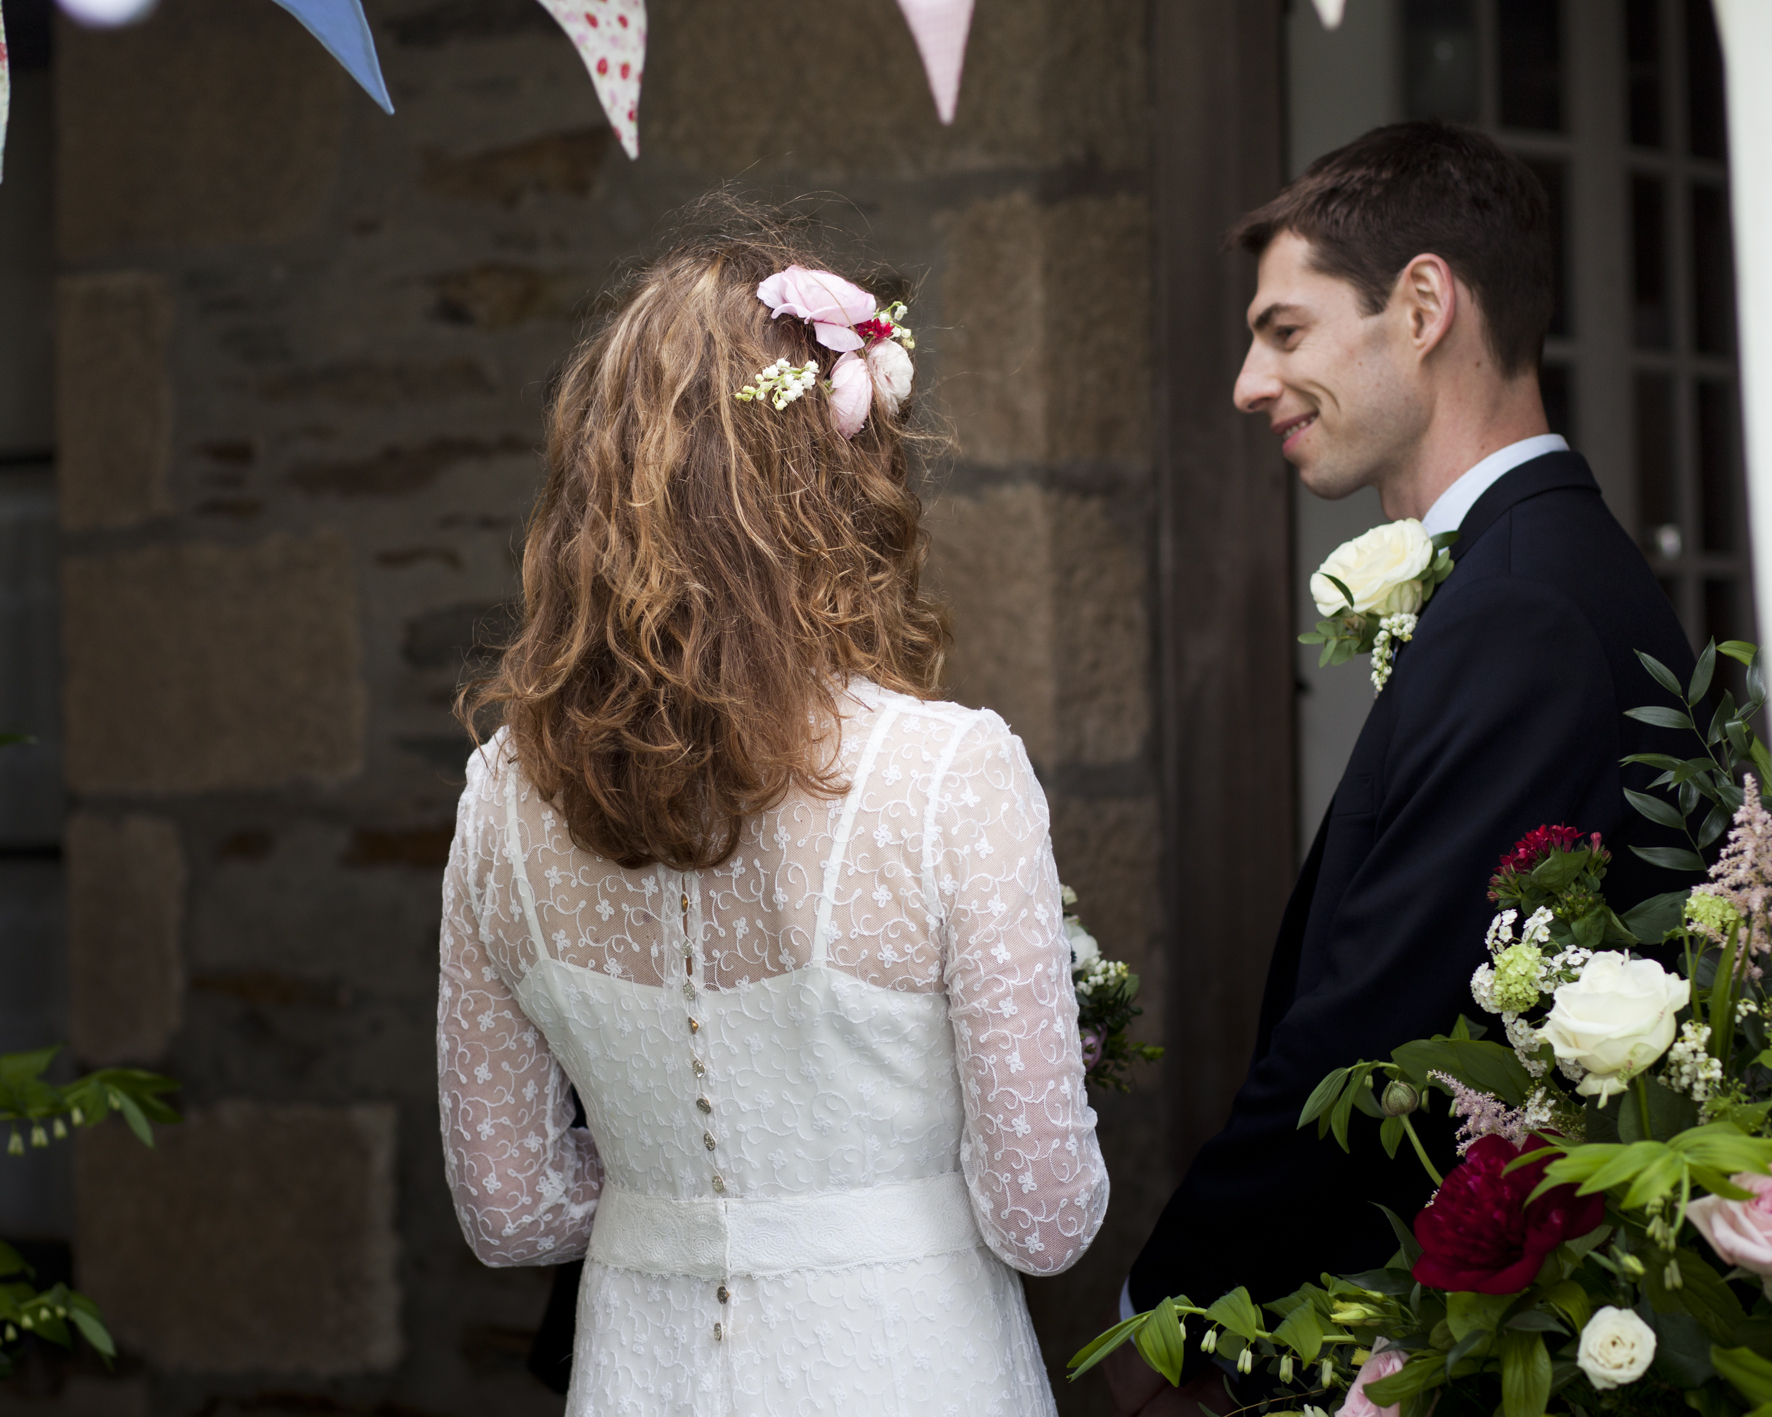 Wedding example_M&P__MG_3366_Claudia Leisinger.jpg